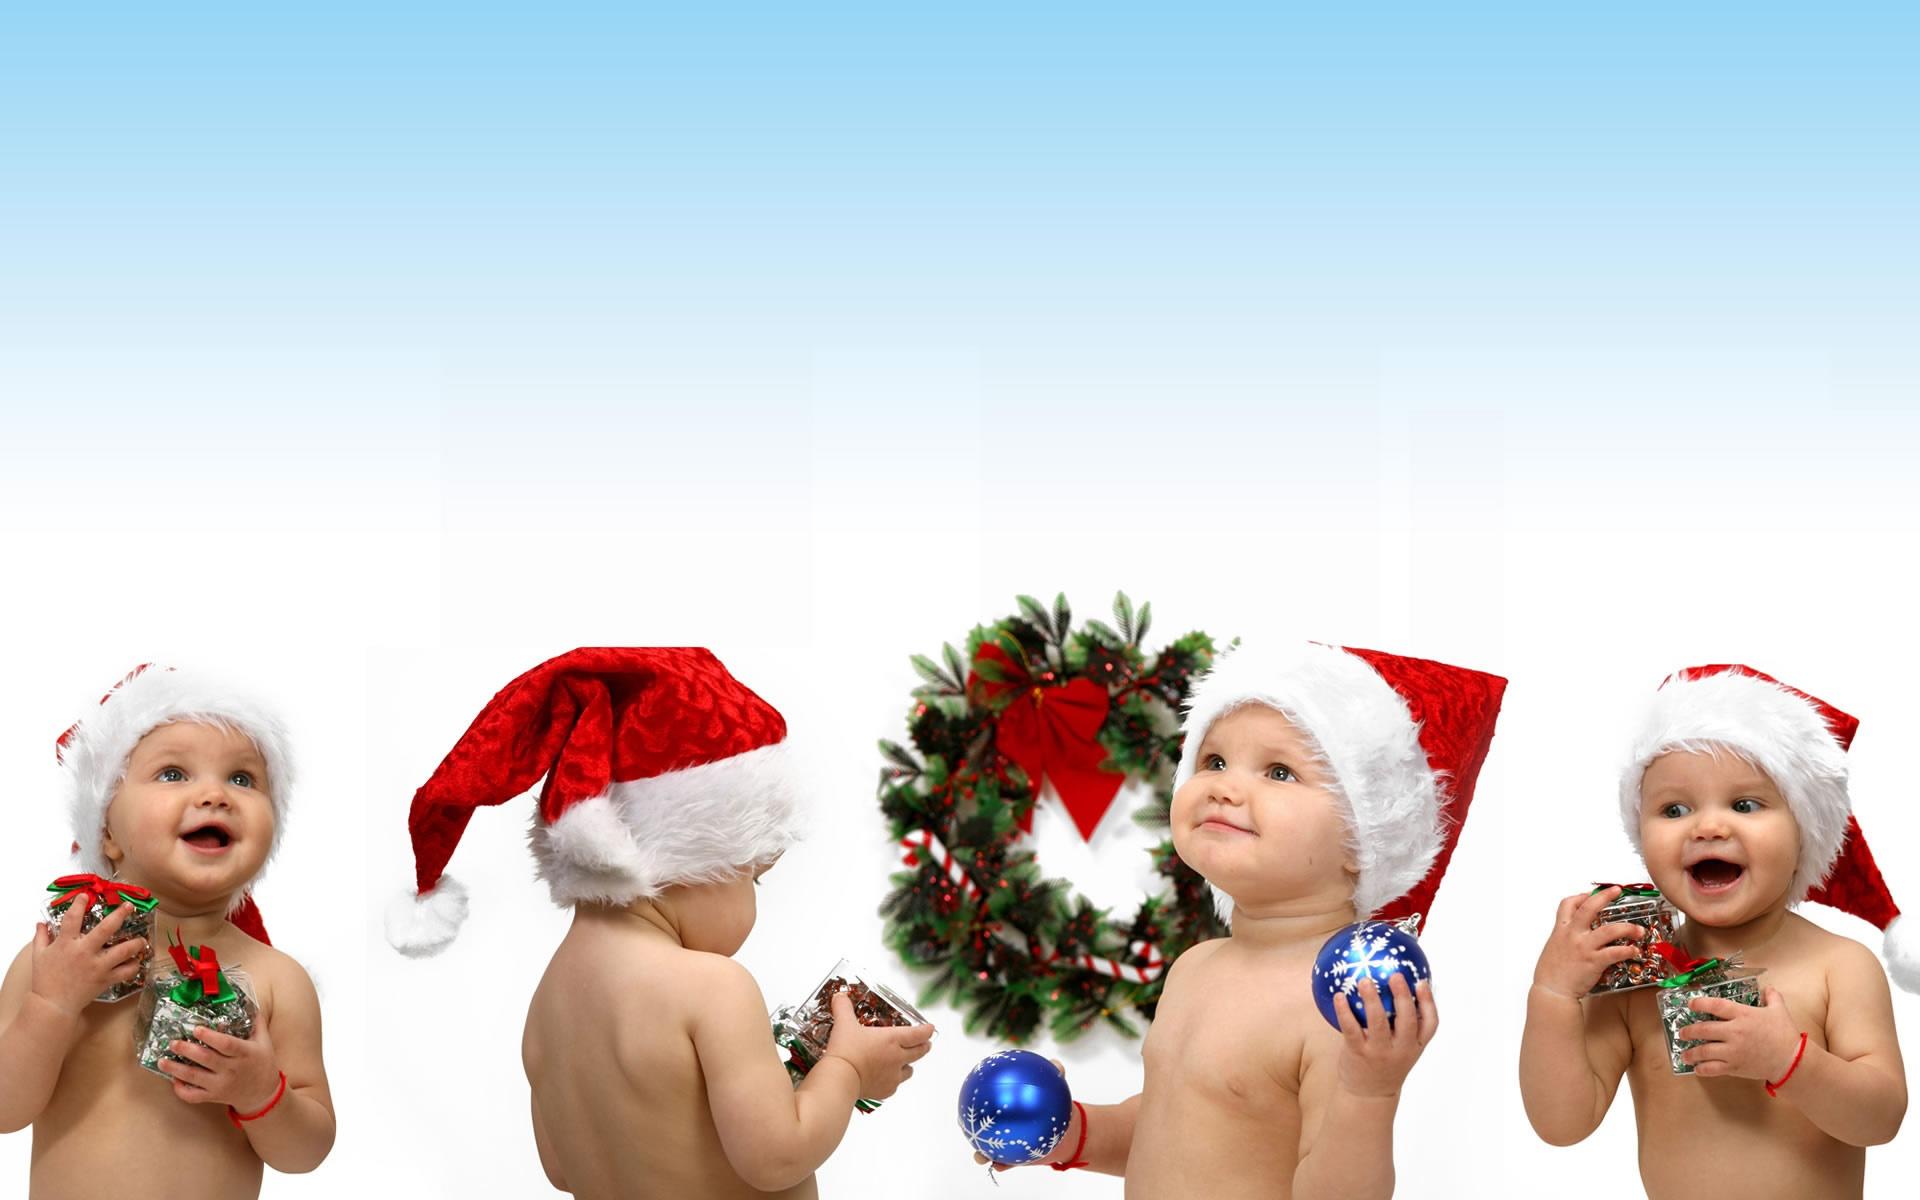 19201200 Christmas children desktop PC and Mac wallpaper 1920x1200